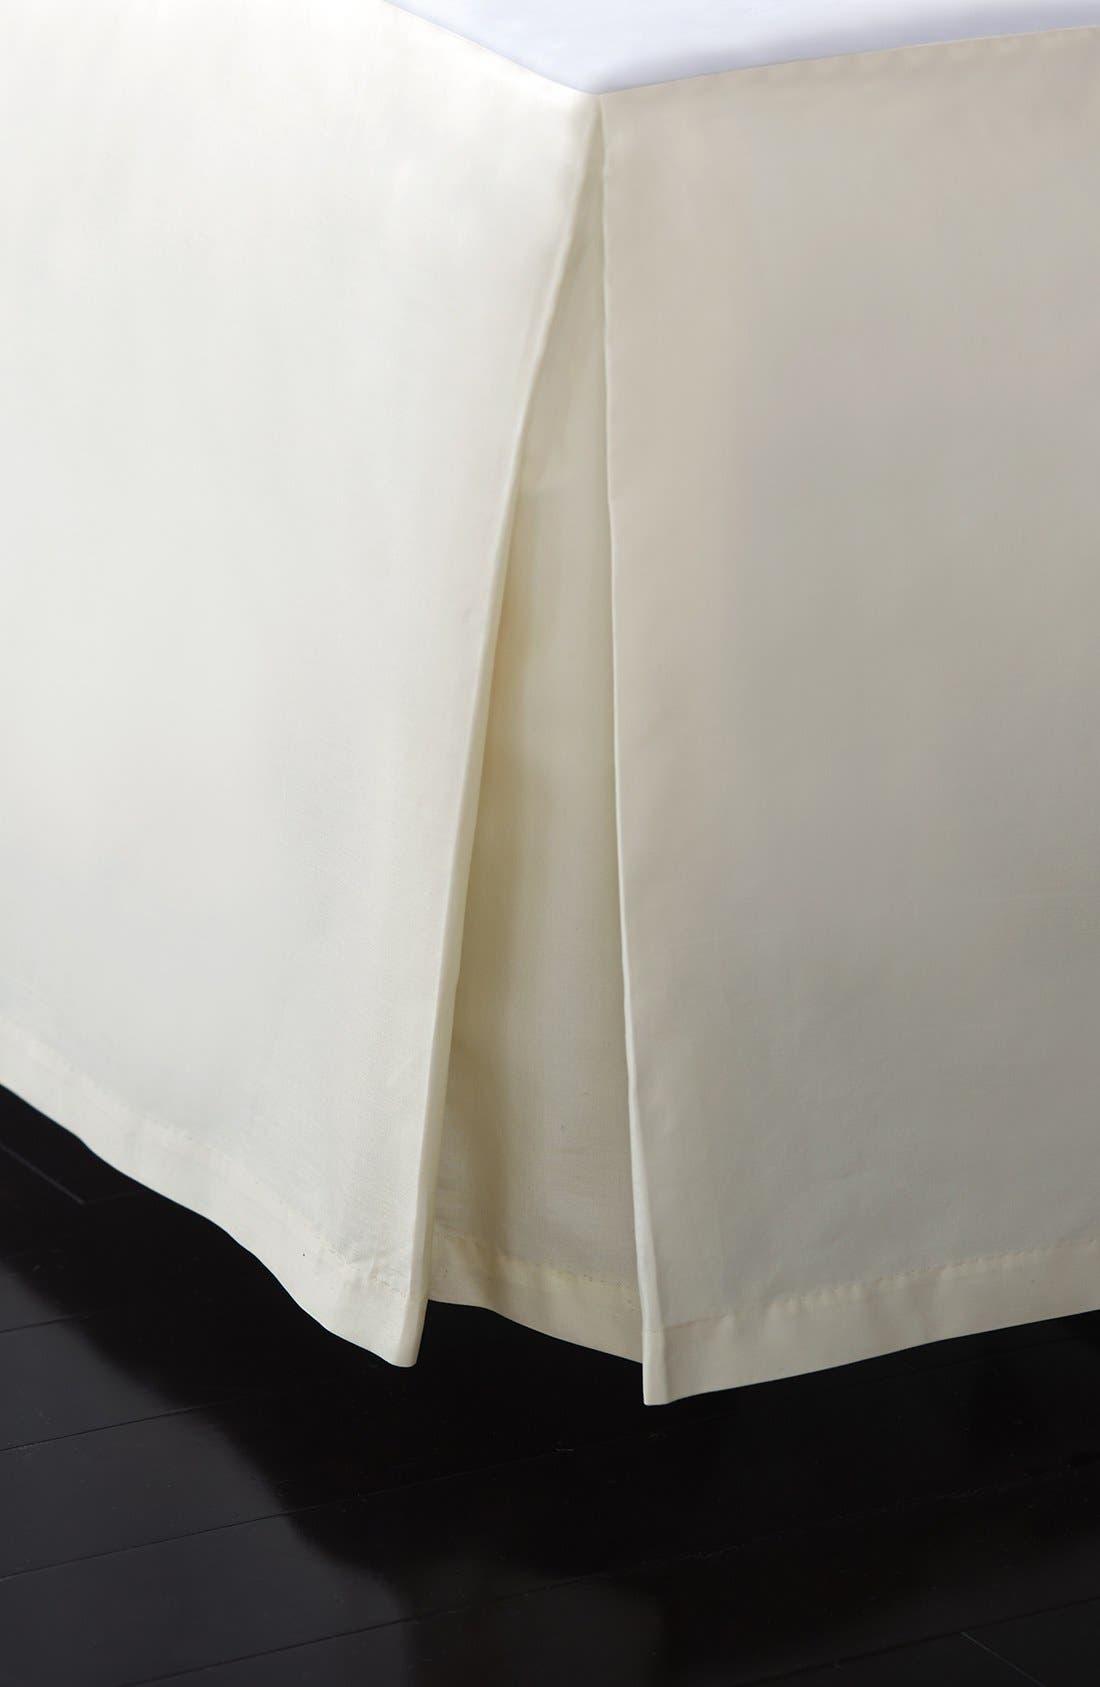 DONNA KARAN NEW YORK,                             Donna Karan Collection 'Reflection' 510 Thread Count Bed Skirt,                             Main thumbnail 1, color,                             IVORY